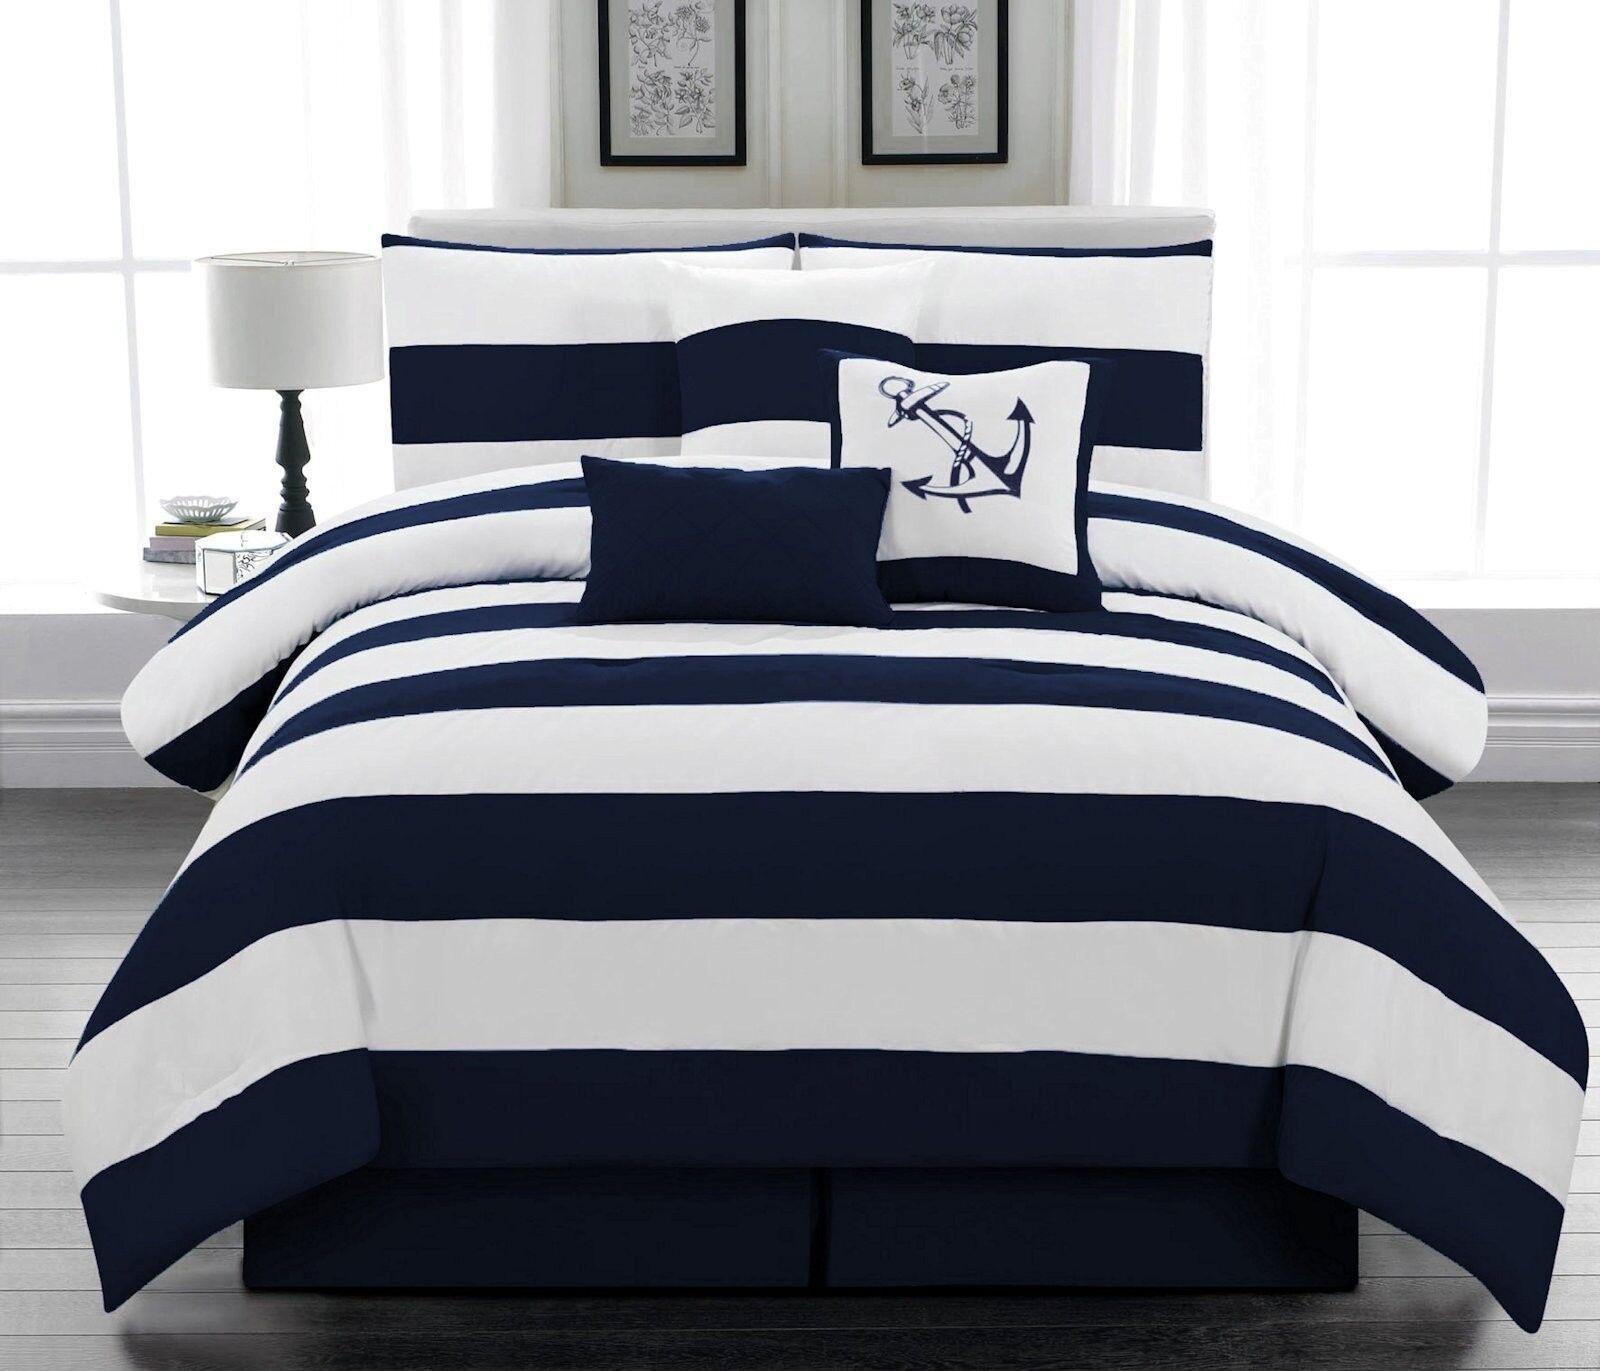 7 pcs Microfiber Nautical Comforter set Navy Blau Striped Full, Queen, King